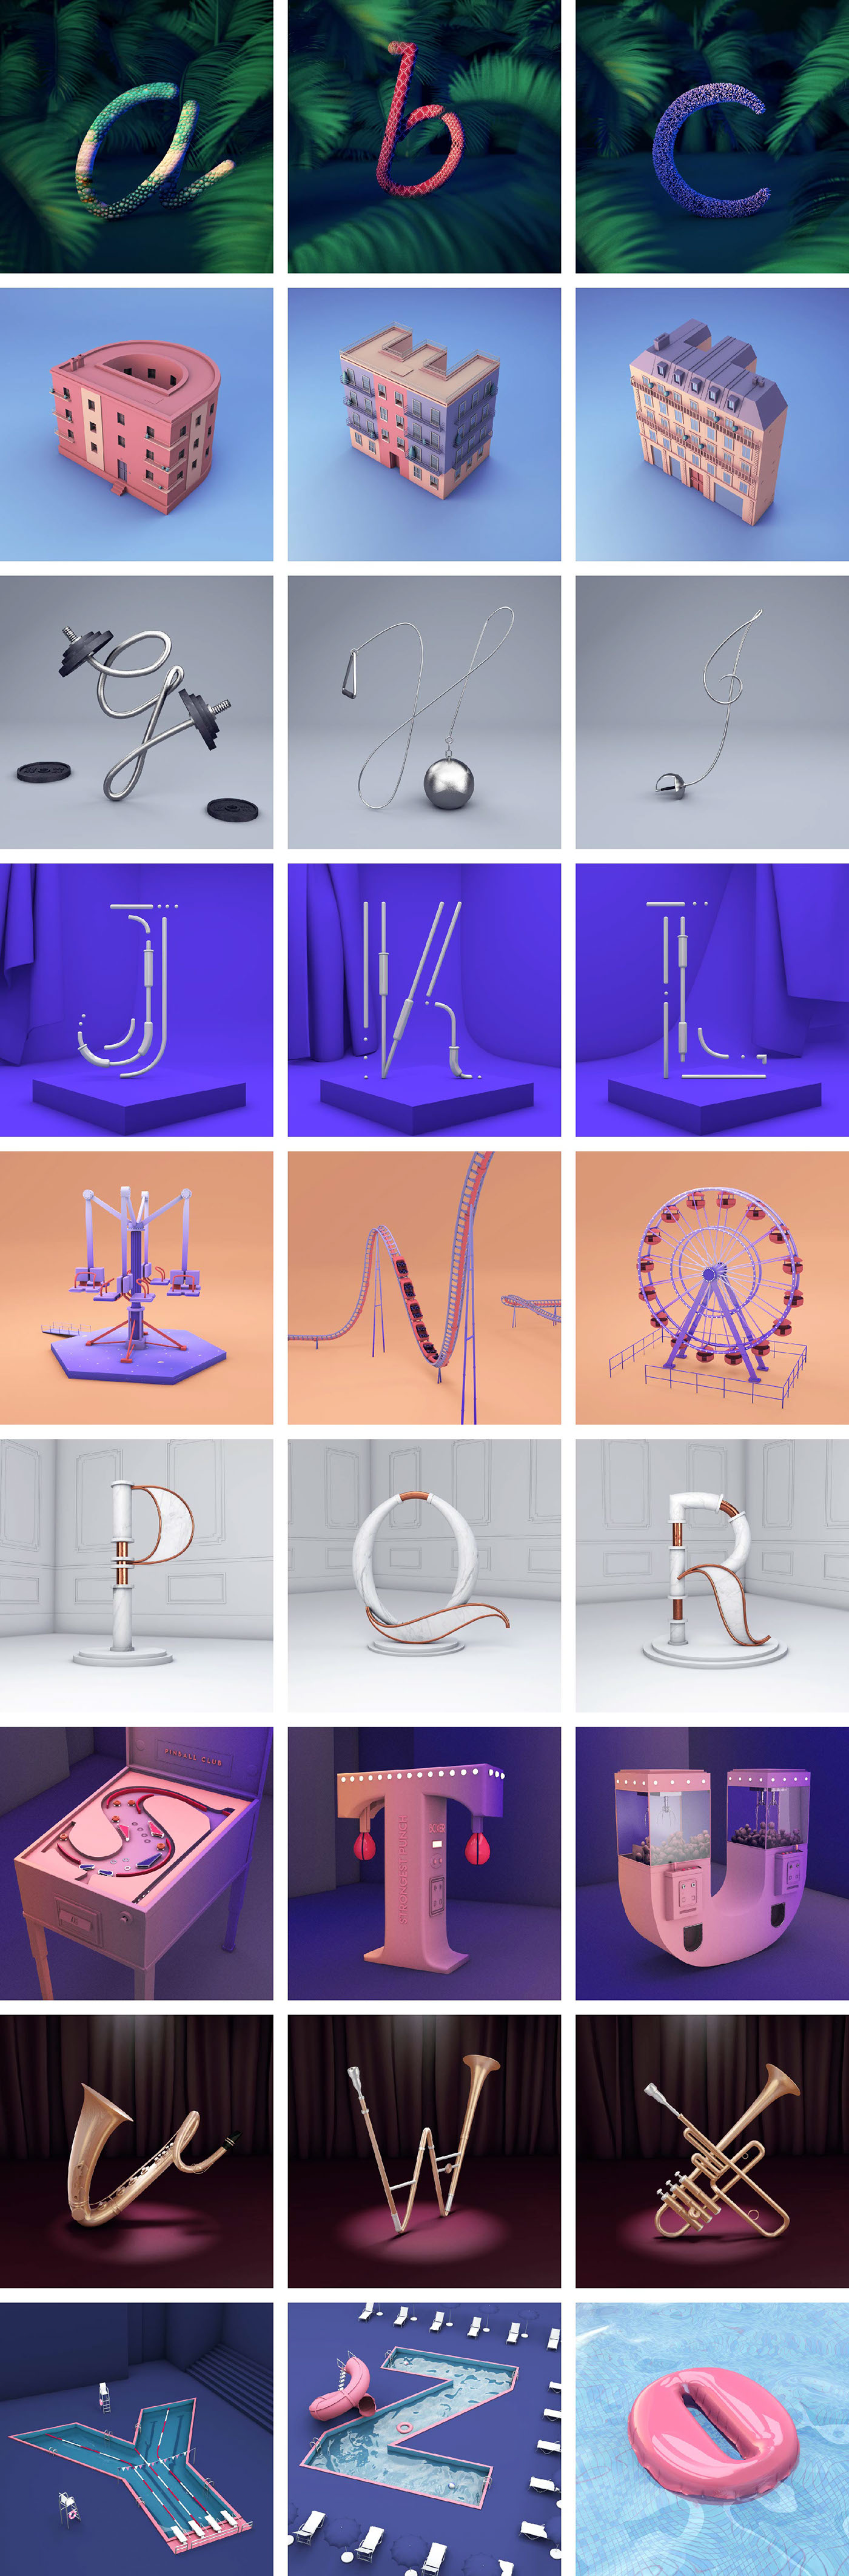 type 3D 36daysoftype 36days letters typography   alphabet everyday c4d intagram